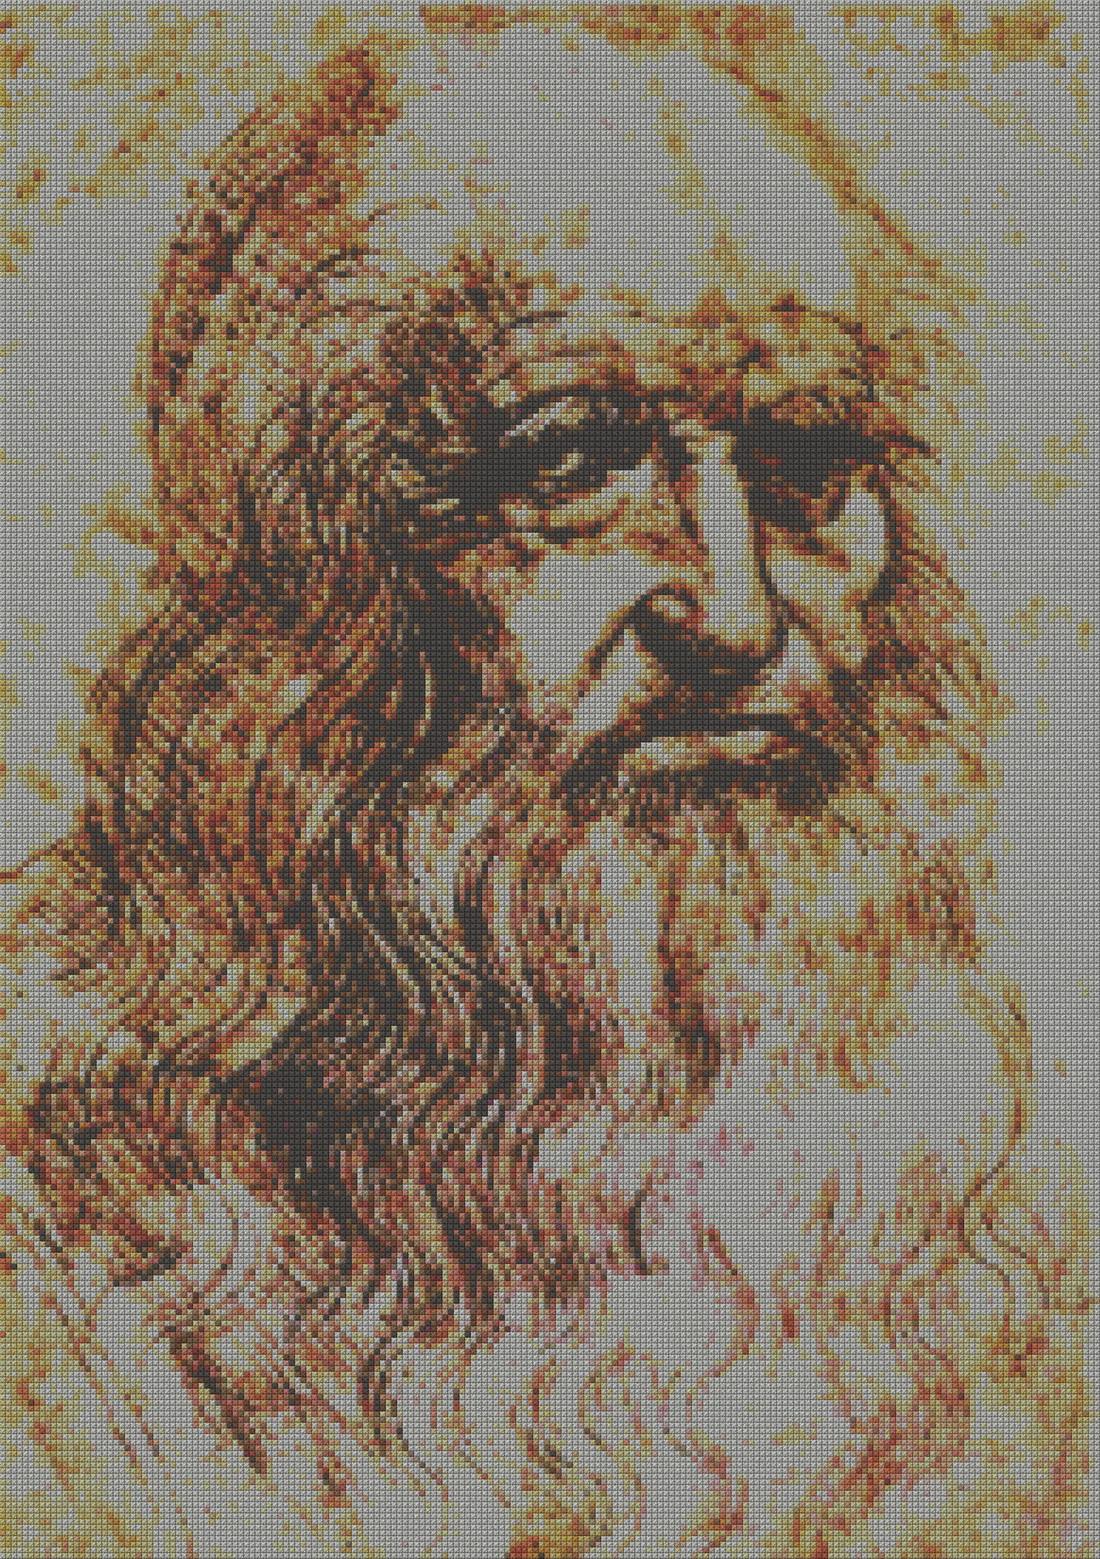 pittori_classici/leonardo/Leonardo11.jpg